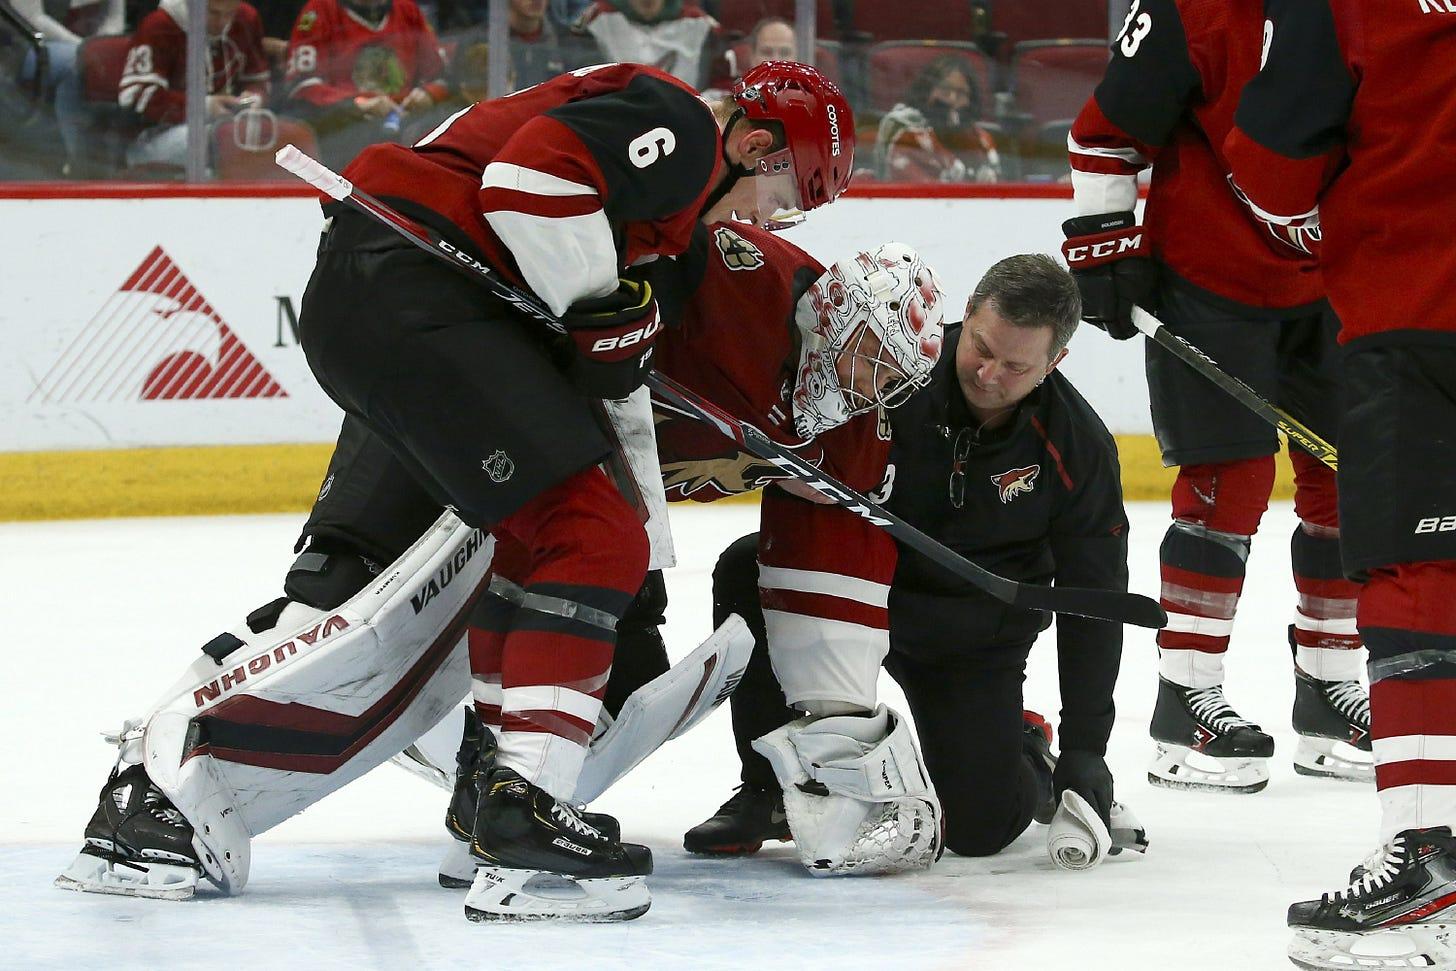 Coyotes goalie Kuemper week to week with lower-body injury